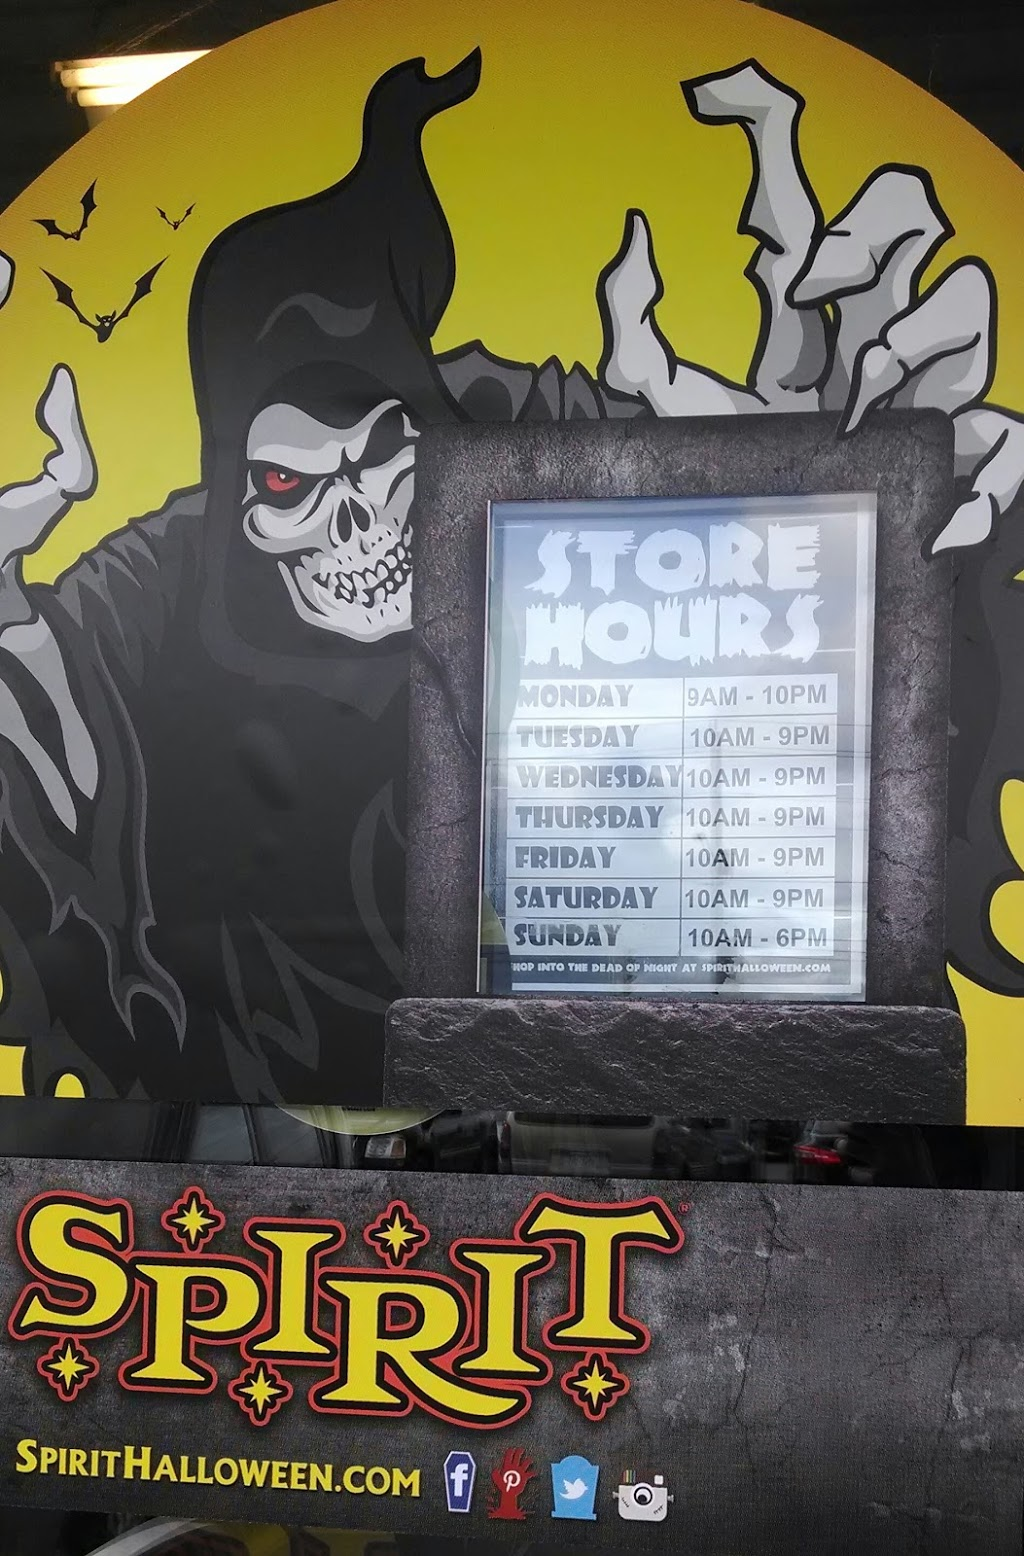 Spirit Halloween | clothing store | 900 Lasalle Blvd, Sudbury, ON P3A 5W8, Canada | 8665860155 OR +1 866-586-0155